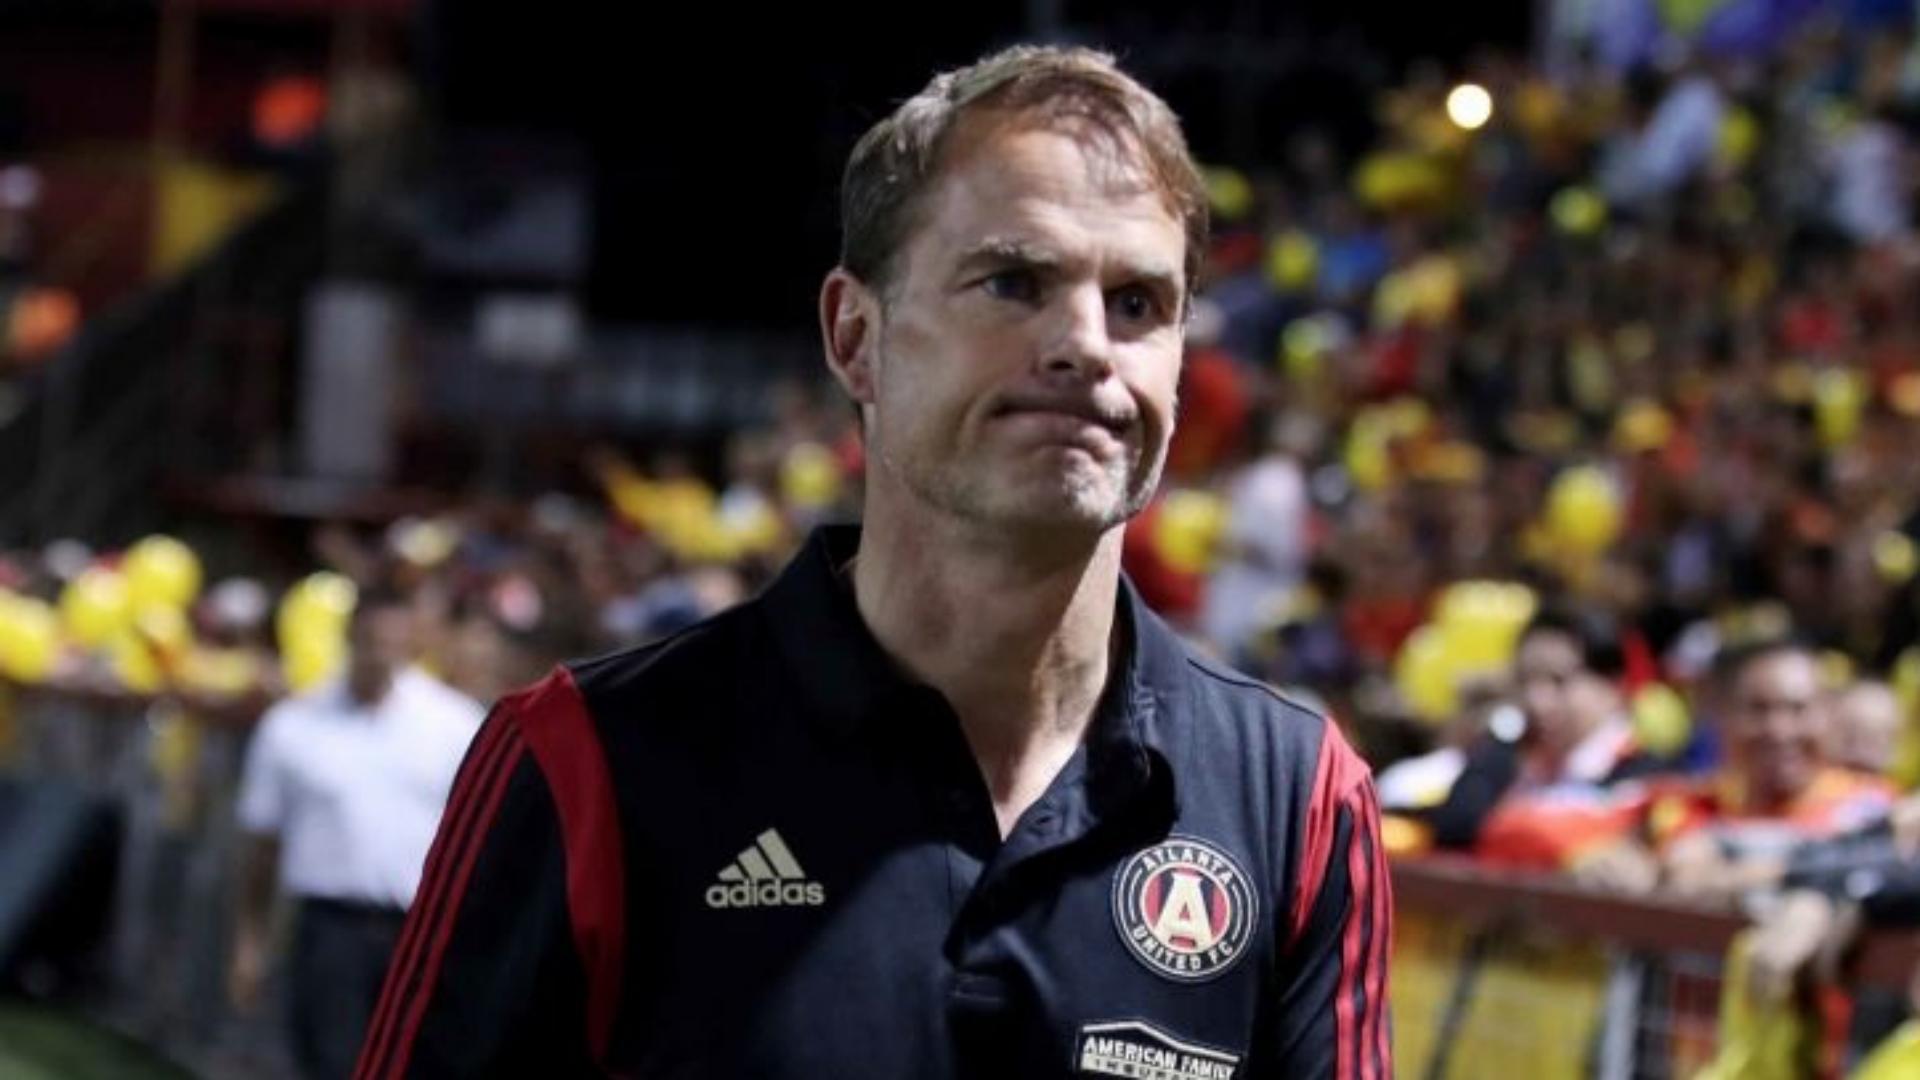 Atlanta United parts ways with manager Frank De Boer